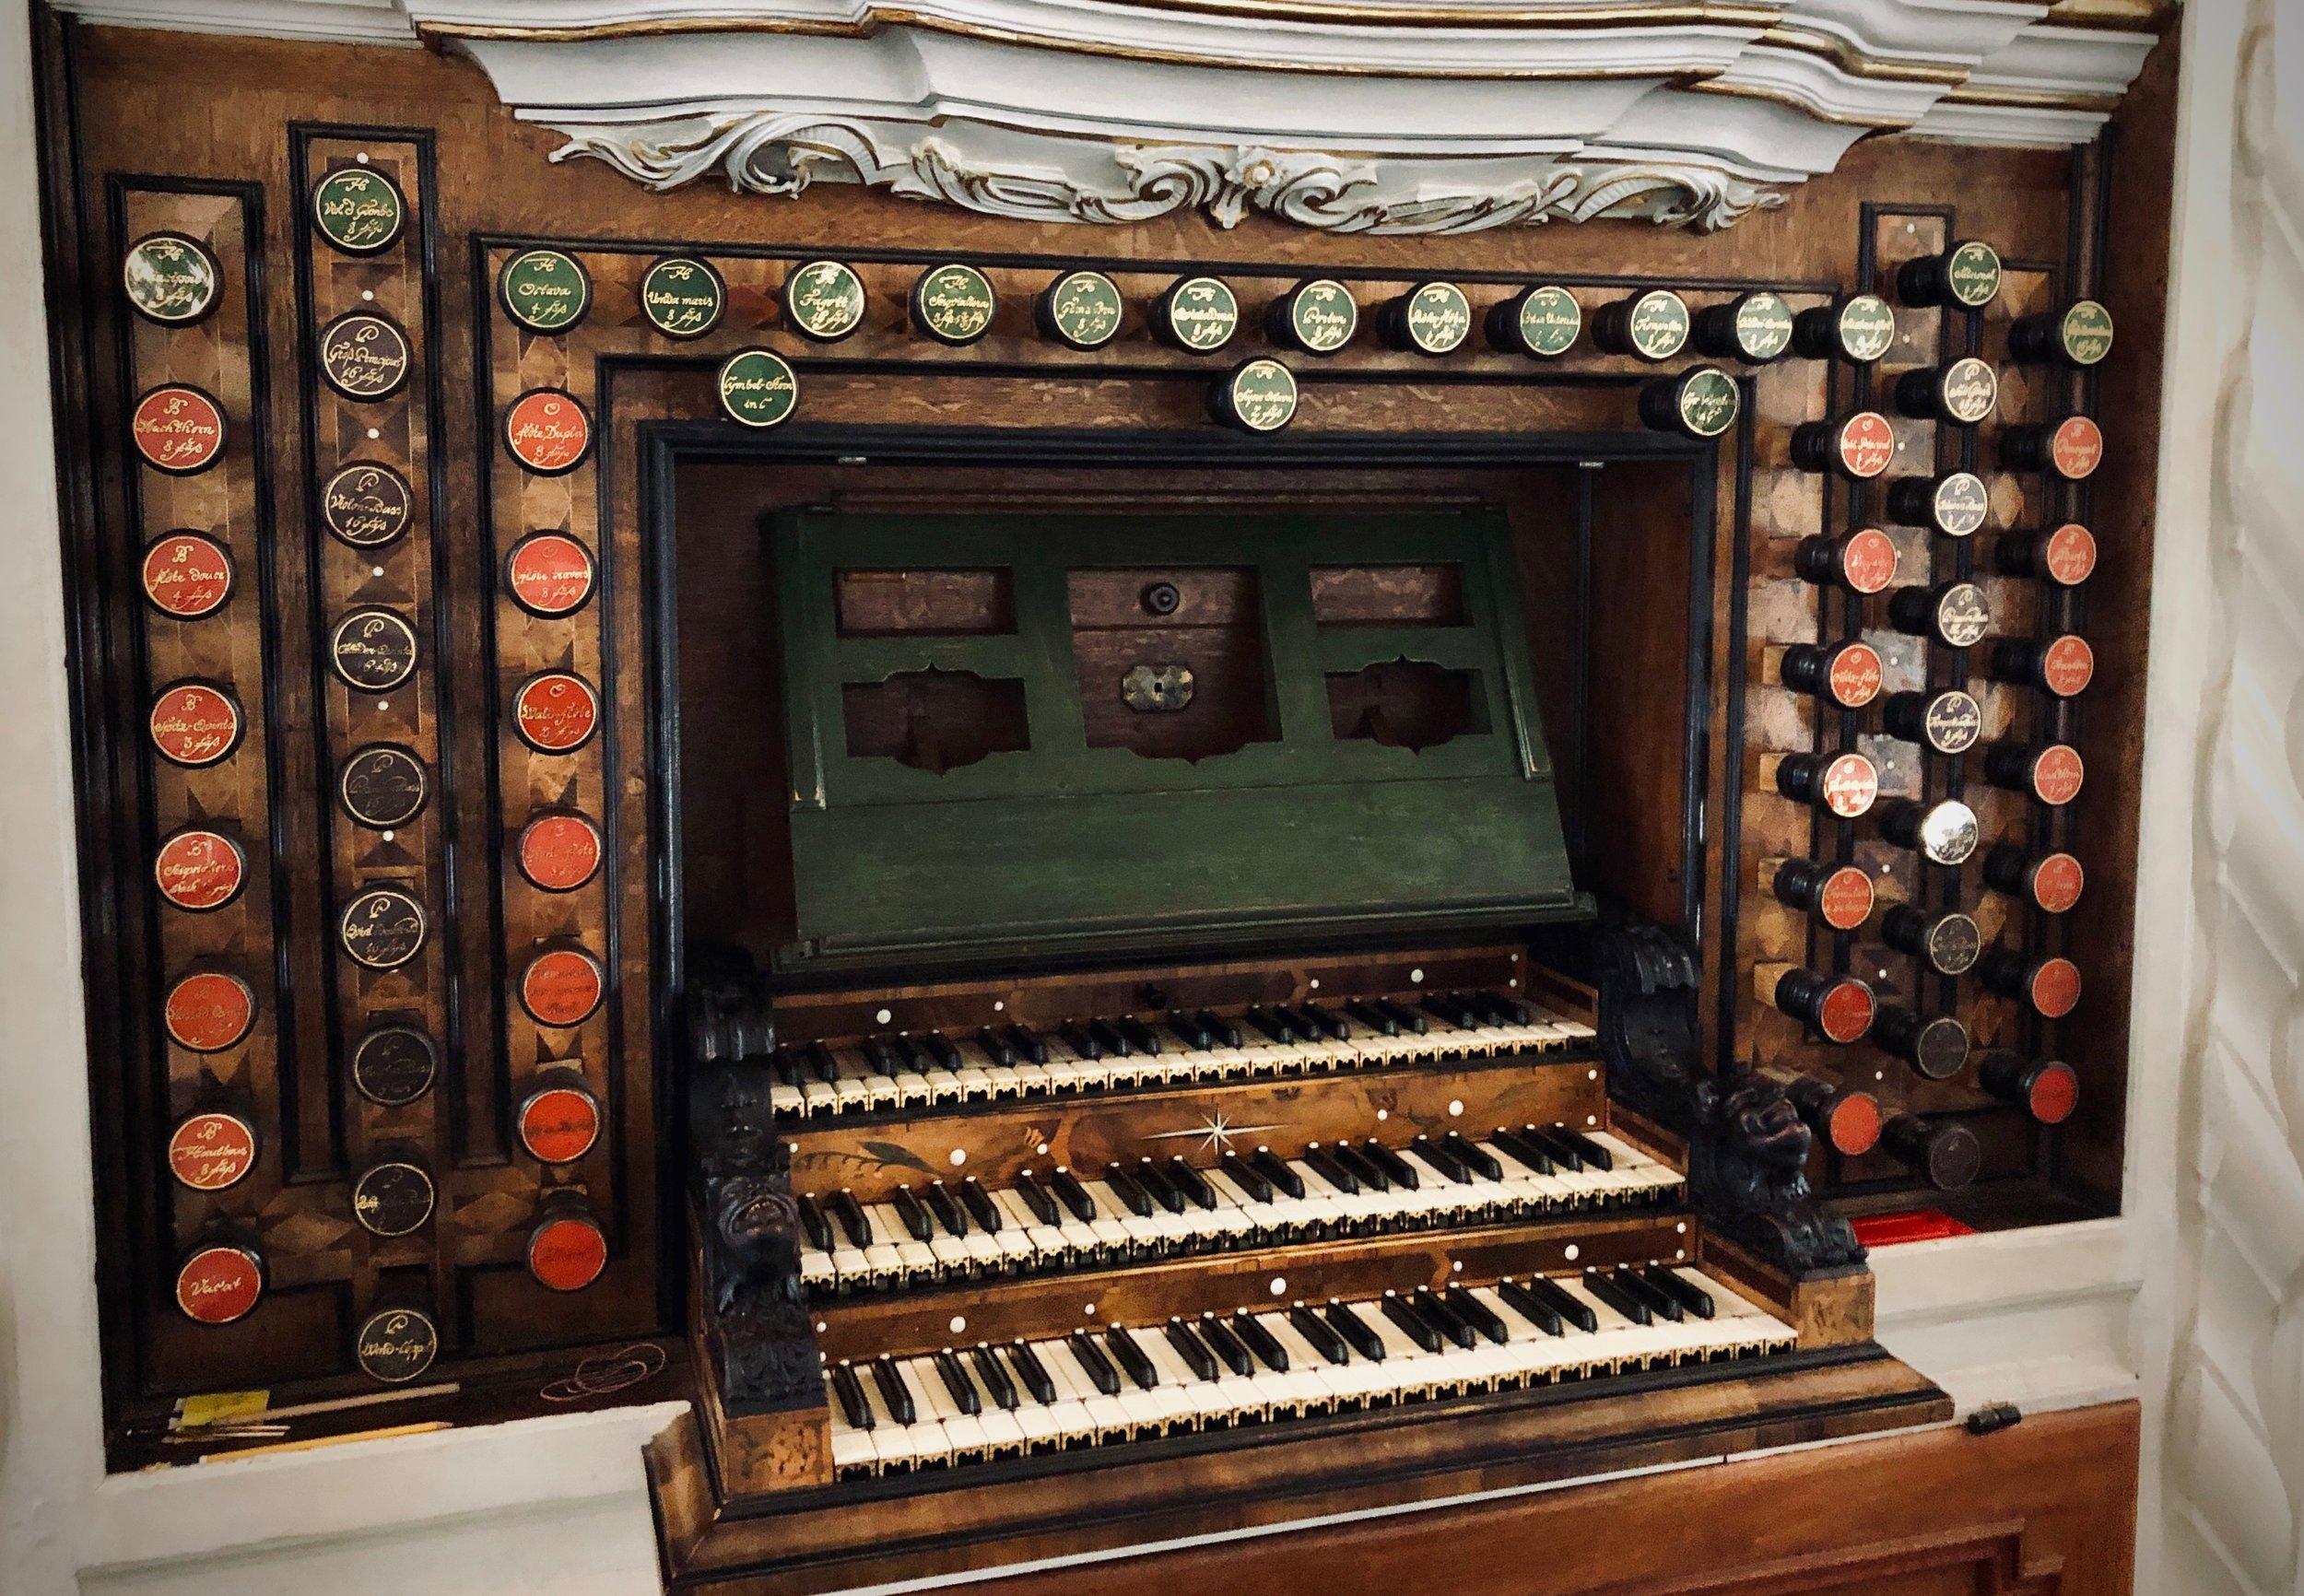 Console, 1730 Trost Organ, Stadtkirche, Waltershausen.